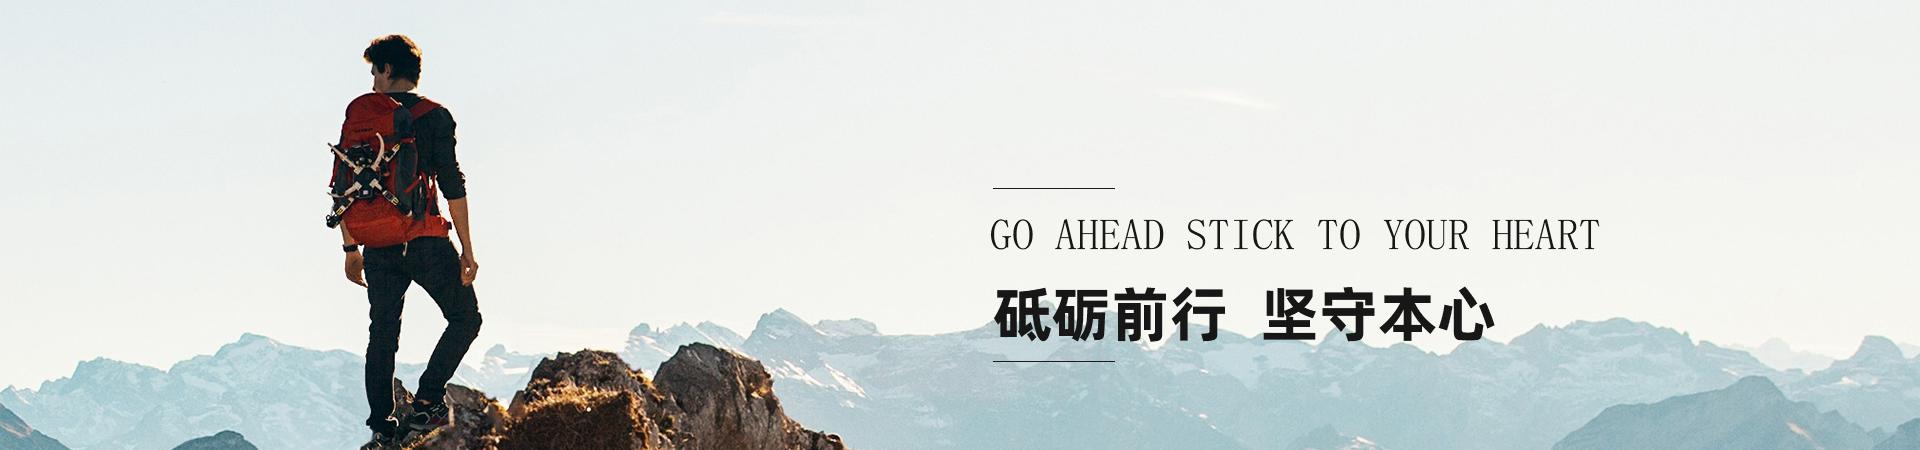 http://www.dzjirun.com/data/upload/202007/20200725085700_537.jpg